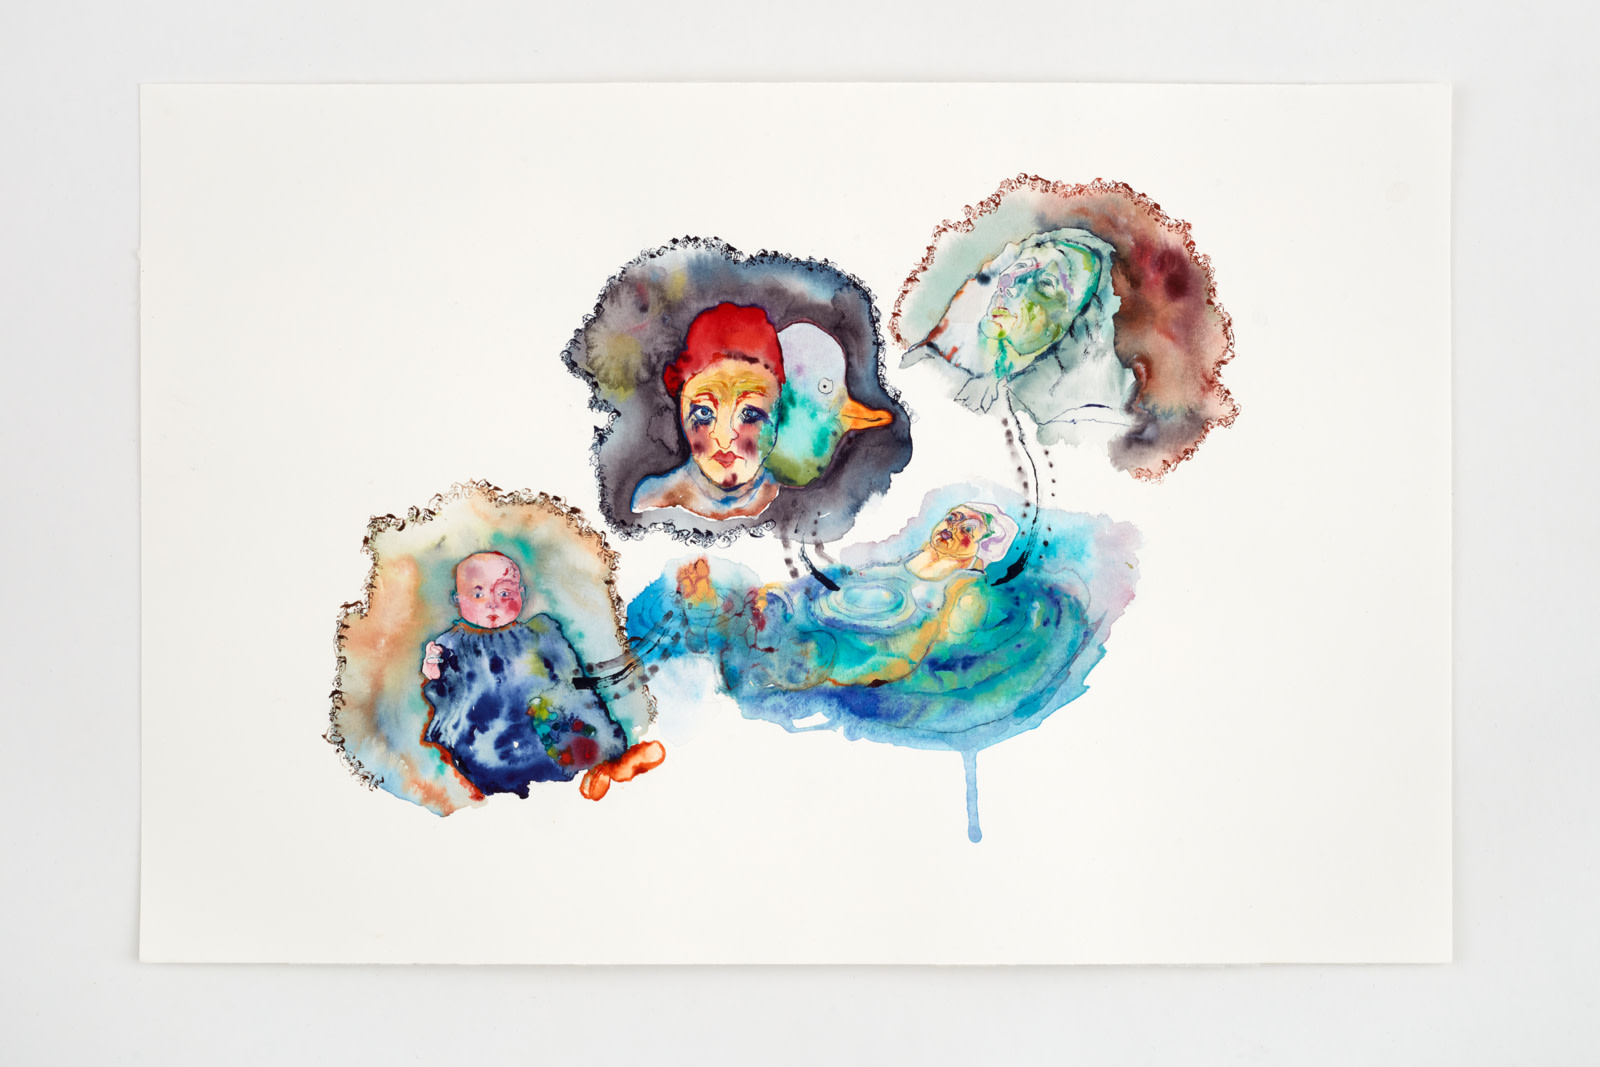 "<div class=""artwork_caption""><div class=""title""><em>Untitled</em>, 2020</div><div class=""medium"">watercolour on paper</div><div class=""dimensions"">site size: 30.4 x 45.4 cm / 12 x 17 ⅞ in<br />frame size: 34.1 x 46.4 x 2.5 cm / 13 ⅜ x 18 ¼ x 1 in</div></div><div class=""link""><span class=""website_contact_form"" data-contact-form-details=""Untitled , 2020  watercolour on paper  site size: 30.4 x 45.4 cm / 12 x 17 ⅞ in frame size: 34.1 x 46.4 x 2.5 cm / 13 ⅜ x 18 ¼ x 1 in"" data-contact-form-image=""https://artlogic-res.cloudinary.com/w_200,h_200,c_fill,f_auto,fl_lossy/ws-sadiecoles/usr/exhibitions/images/exhibitions/829/hq24-hm16778d-untitled_unframed.jpeg"">Enquire</span></div>"